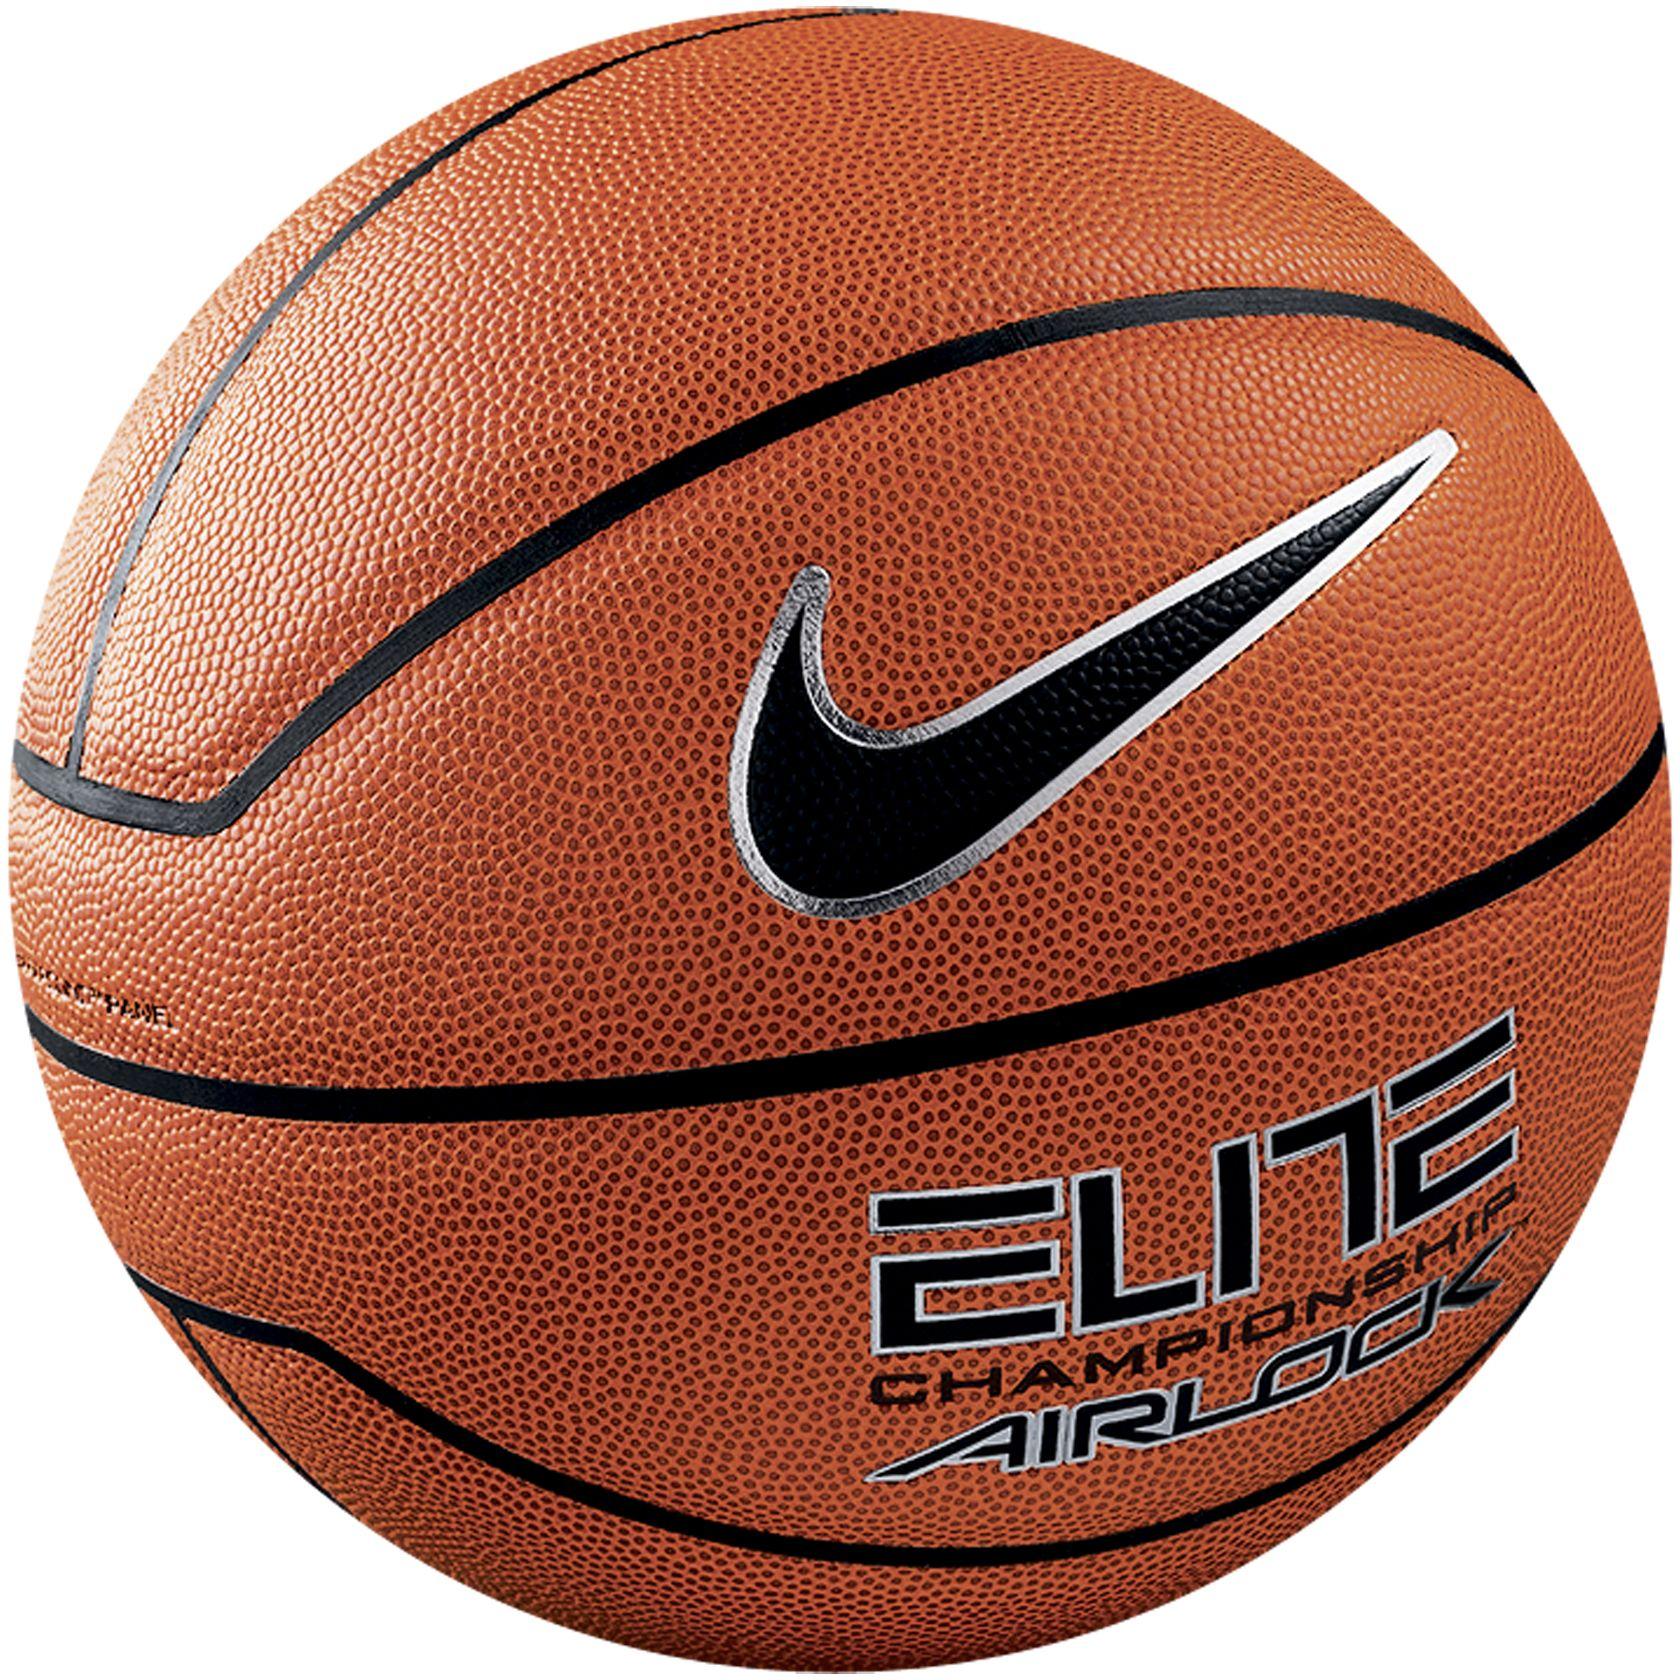 NIKE Nike Elite Championship Airlock Basketball